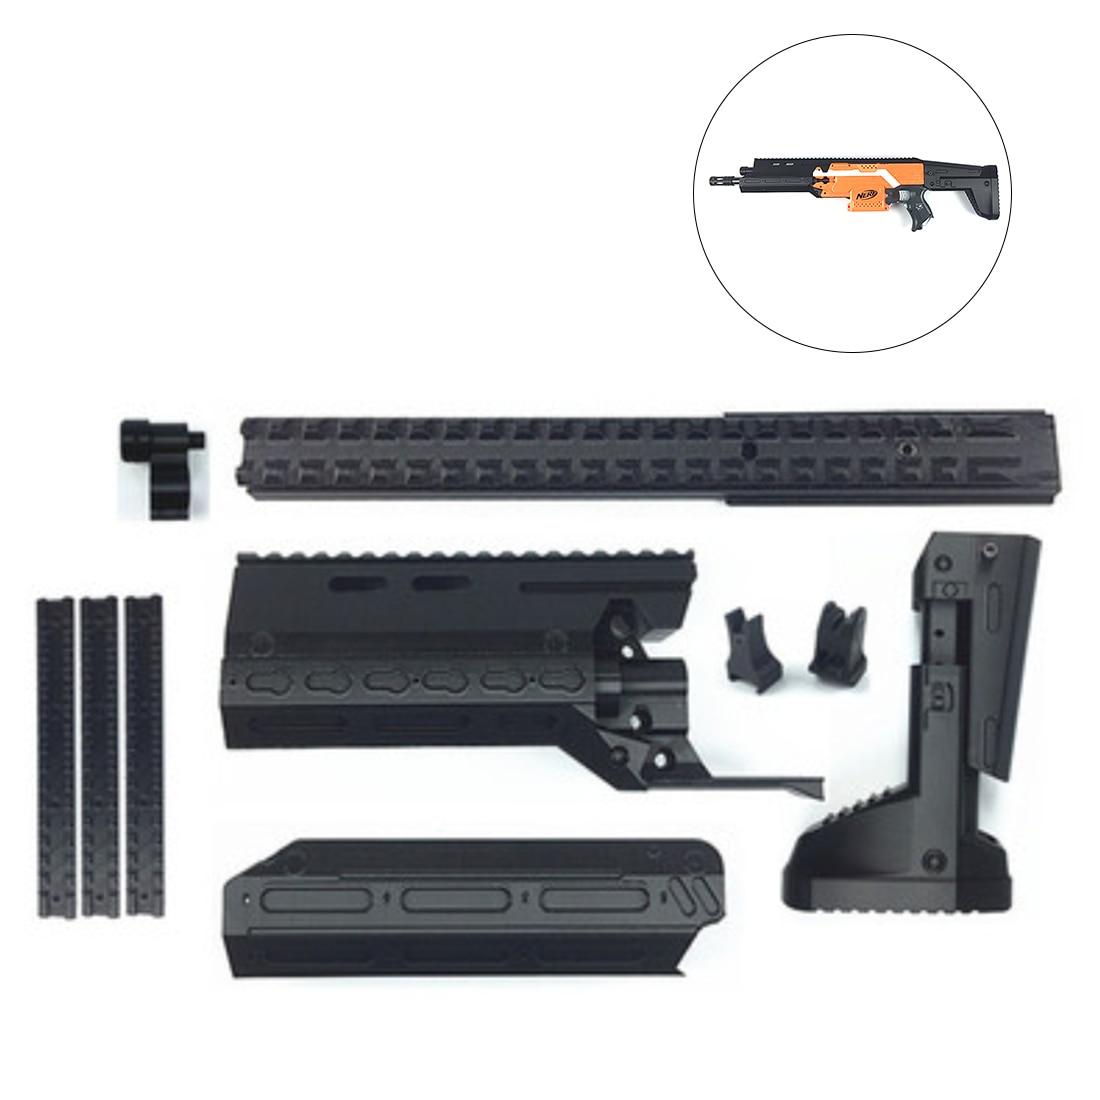 купить Surwish 3D Printing A-CR Type Appearence Modified Kit for Nerf N-Strike Elite Stryfe Blaster - Black по цене 5575.12 рублей